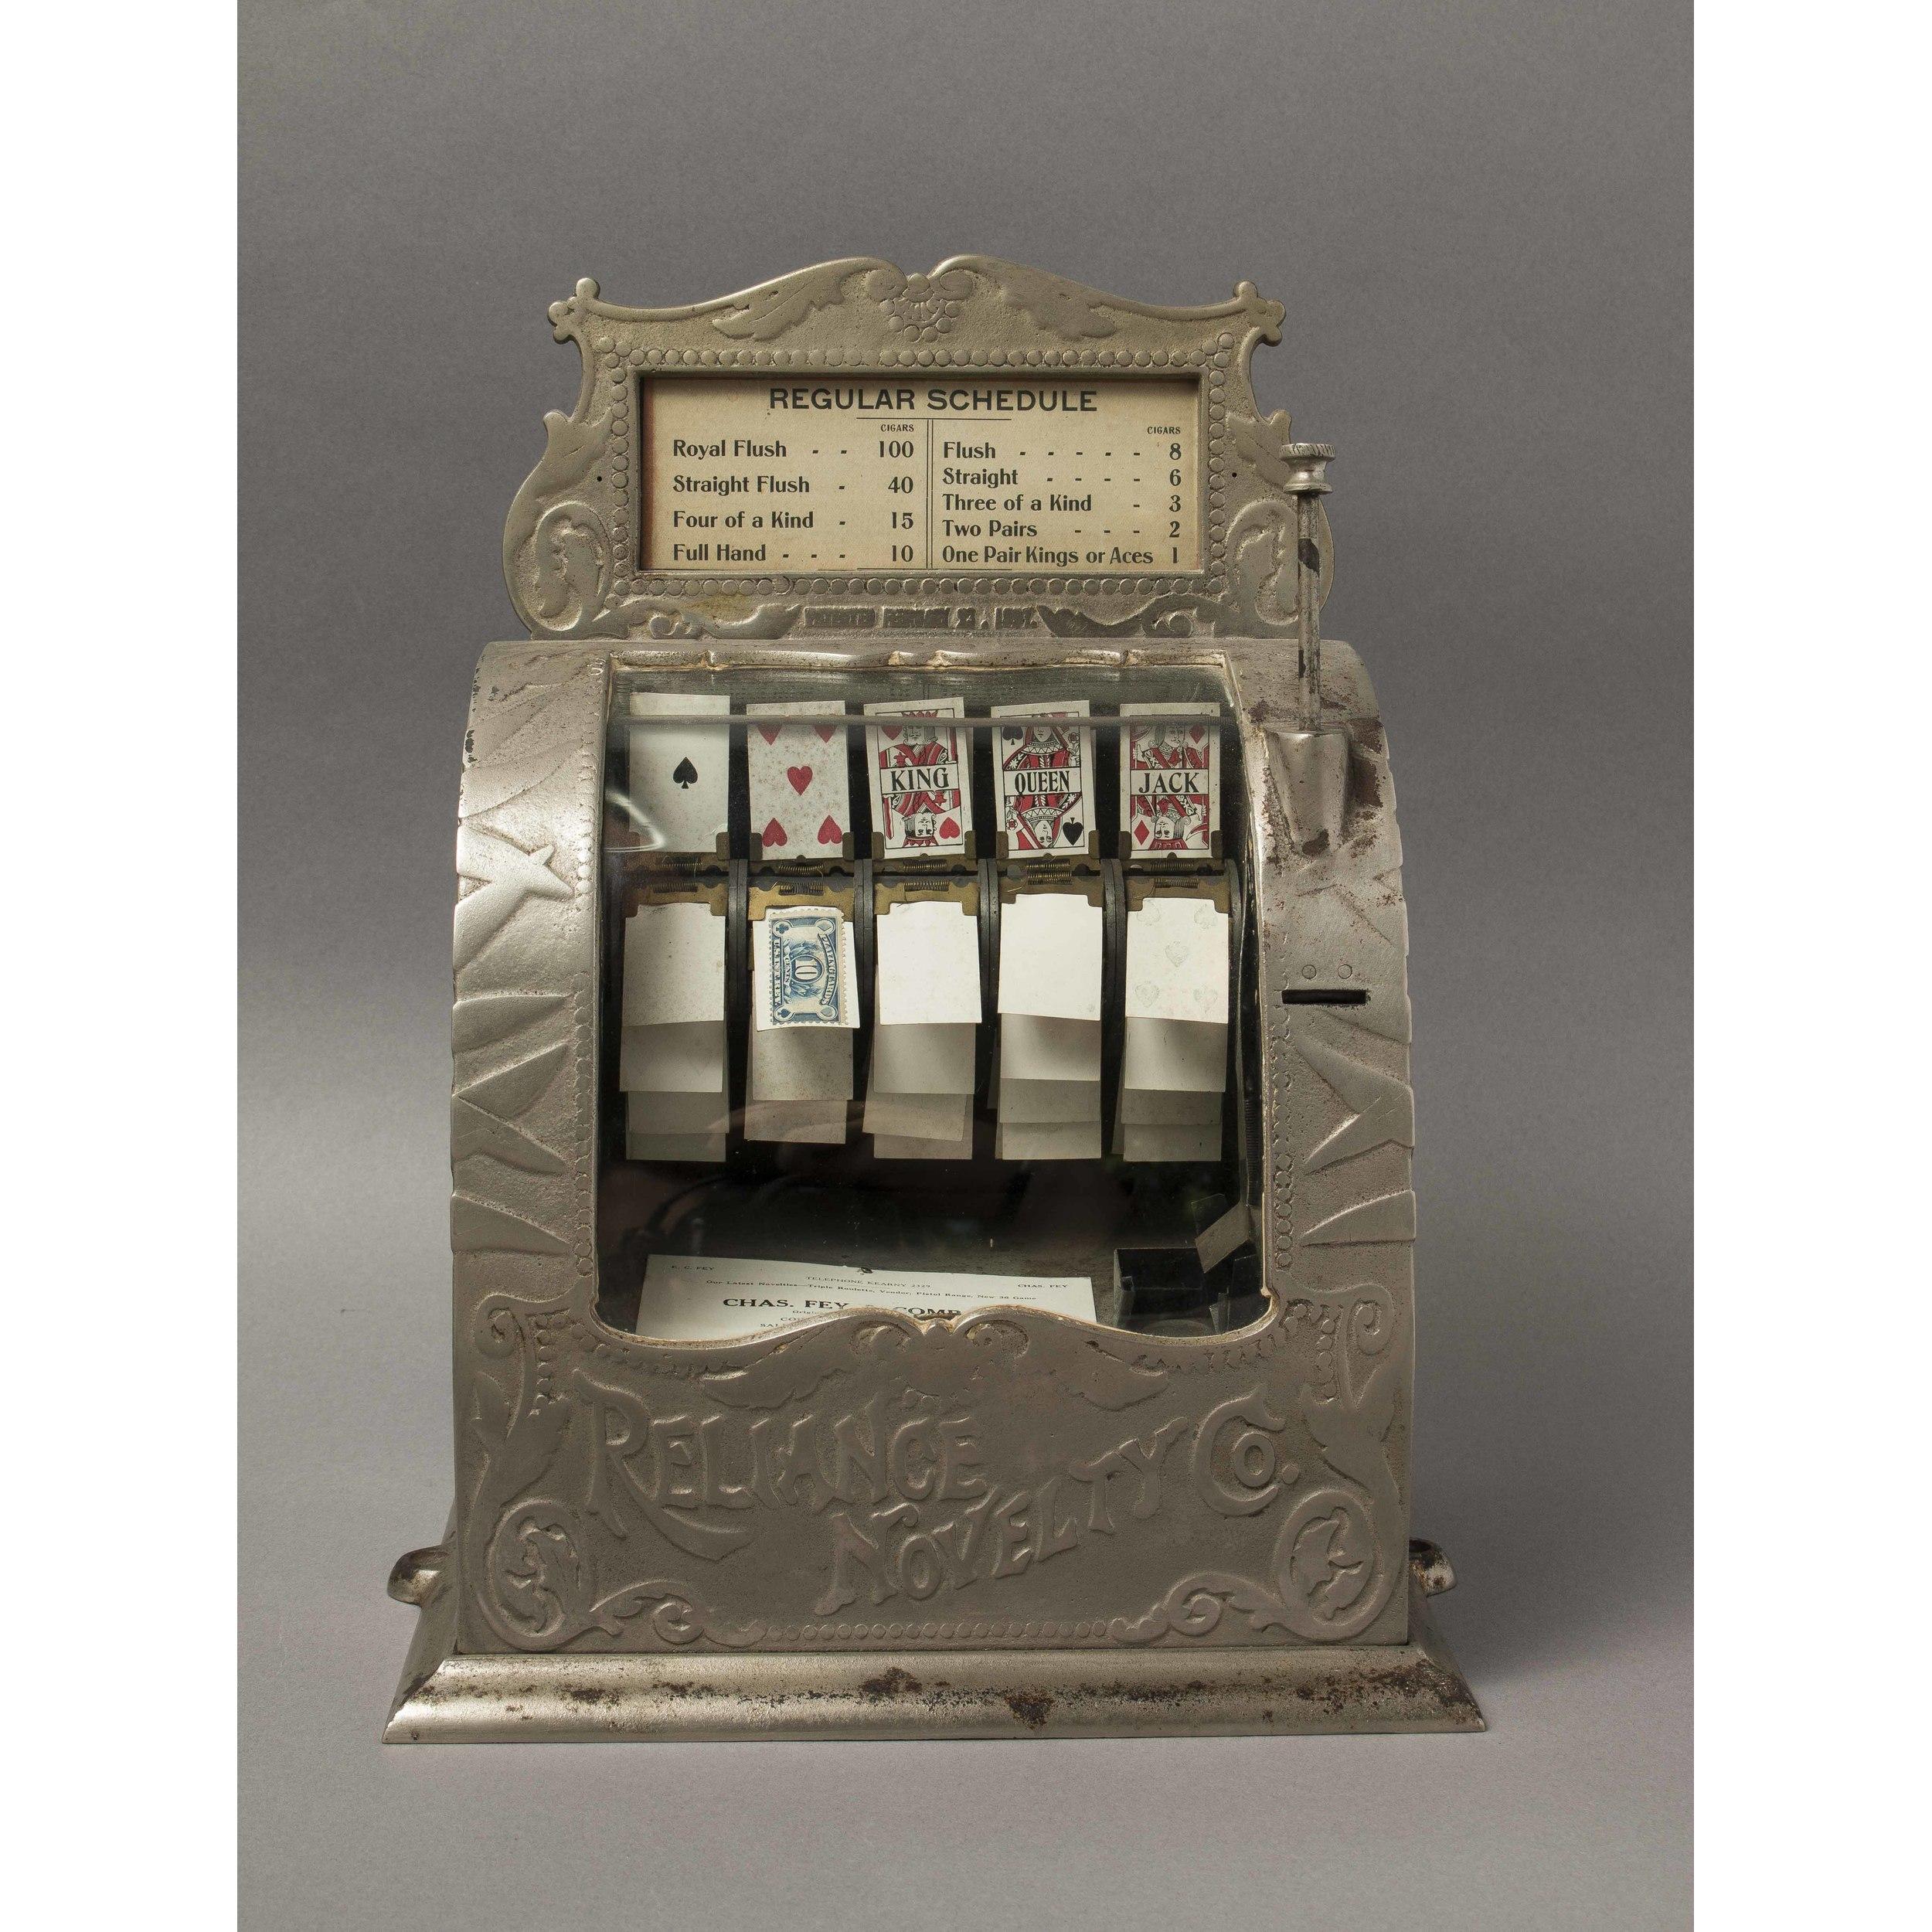 Reliance Novelty Co Cast Iron Trade Stimulator